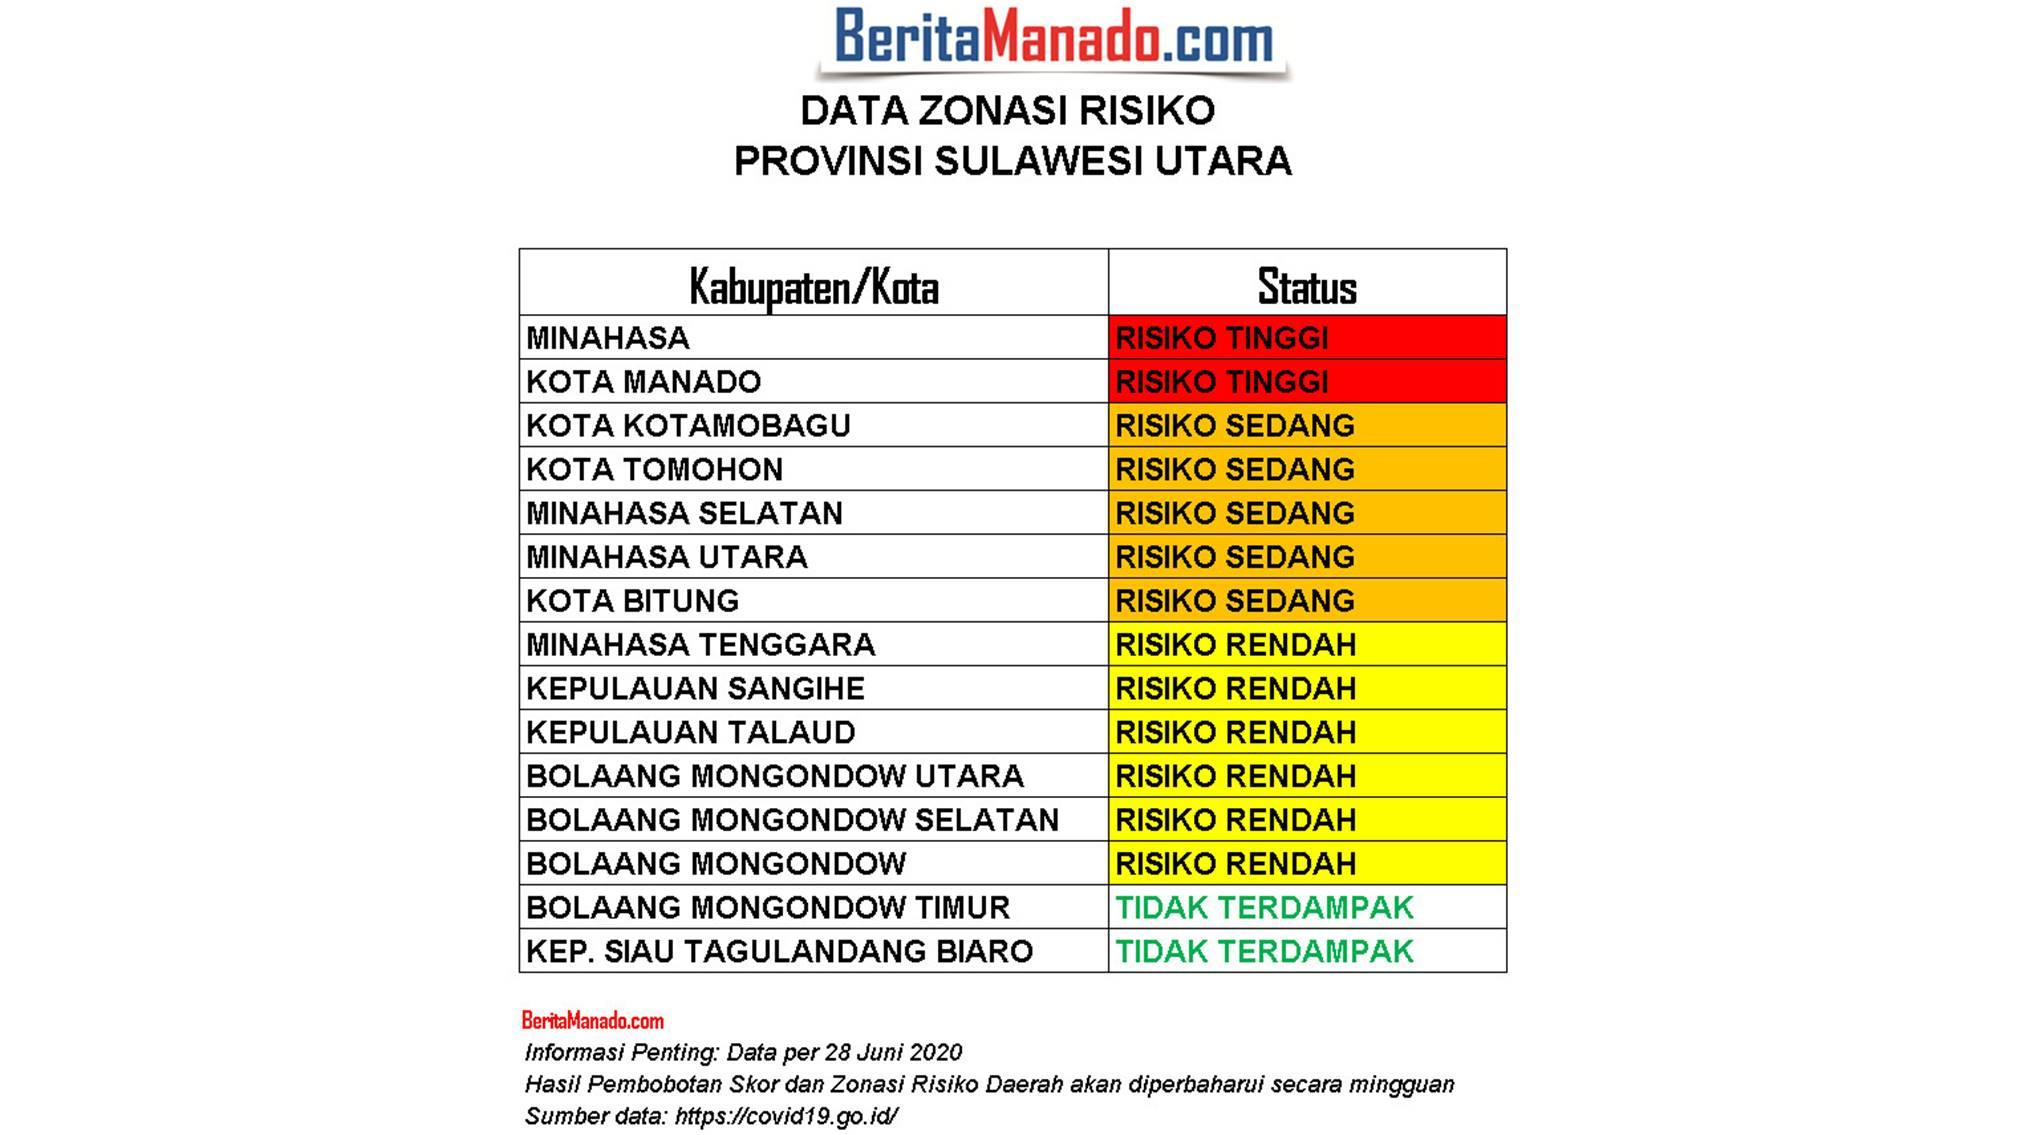 Data Zonasi Risiko Provinsi Sulawesi Utara